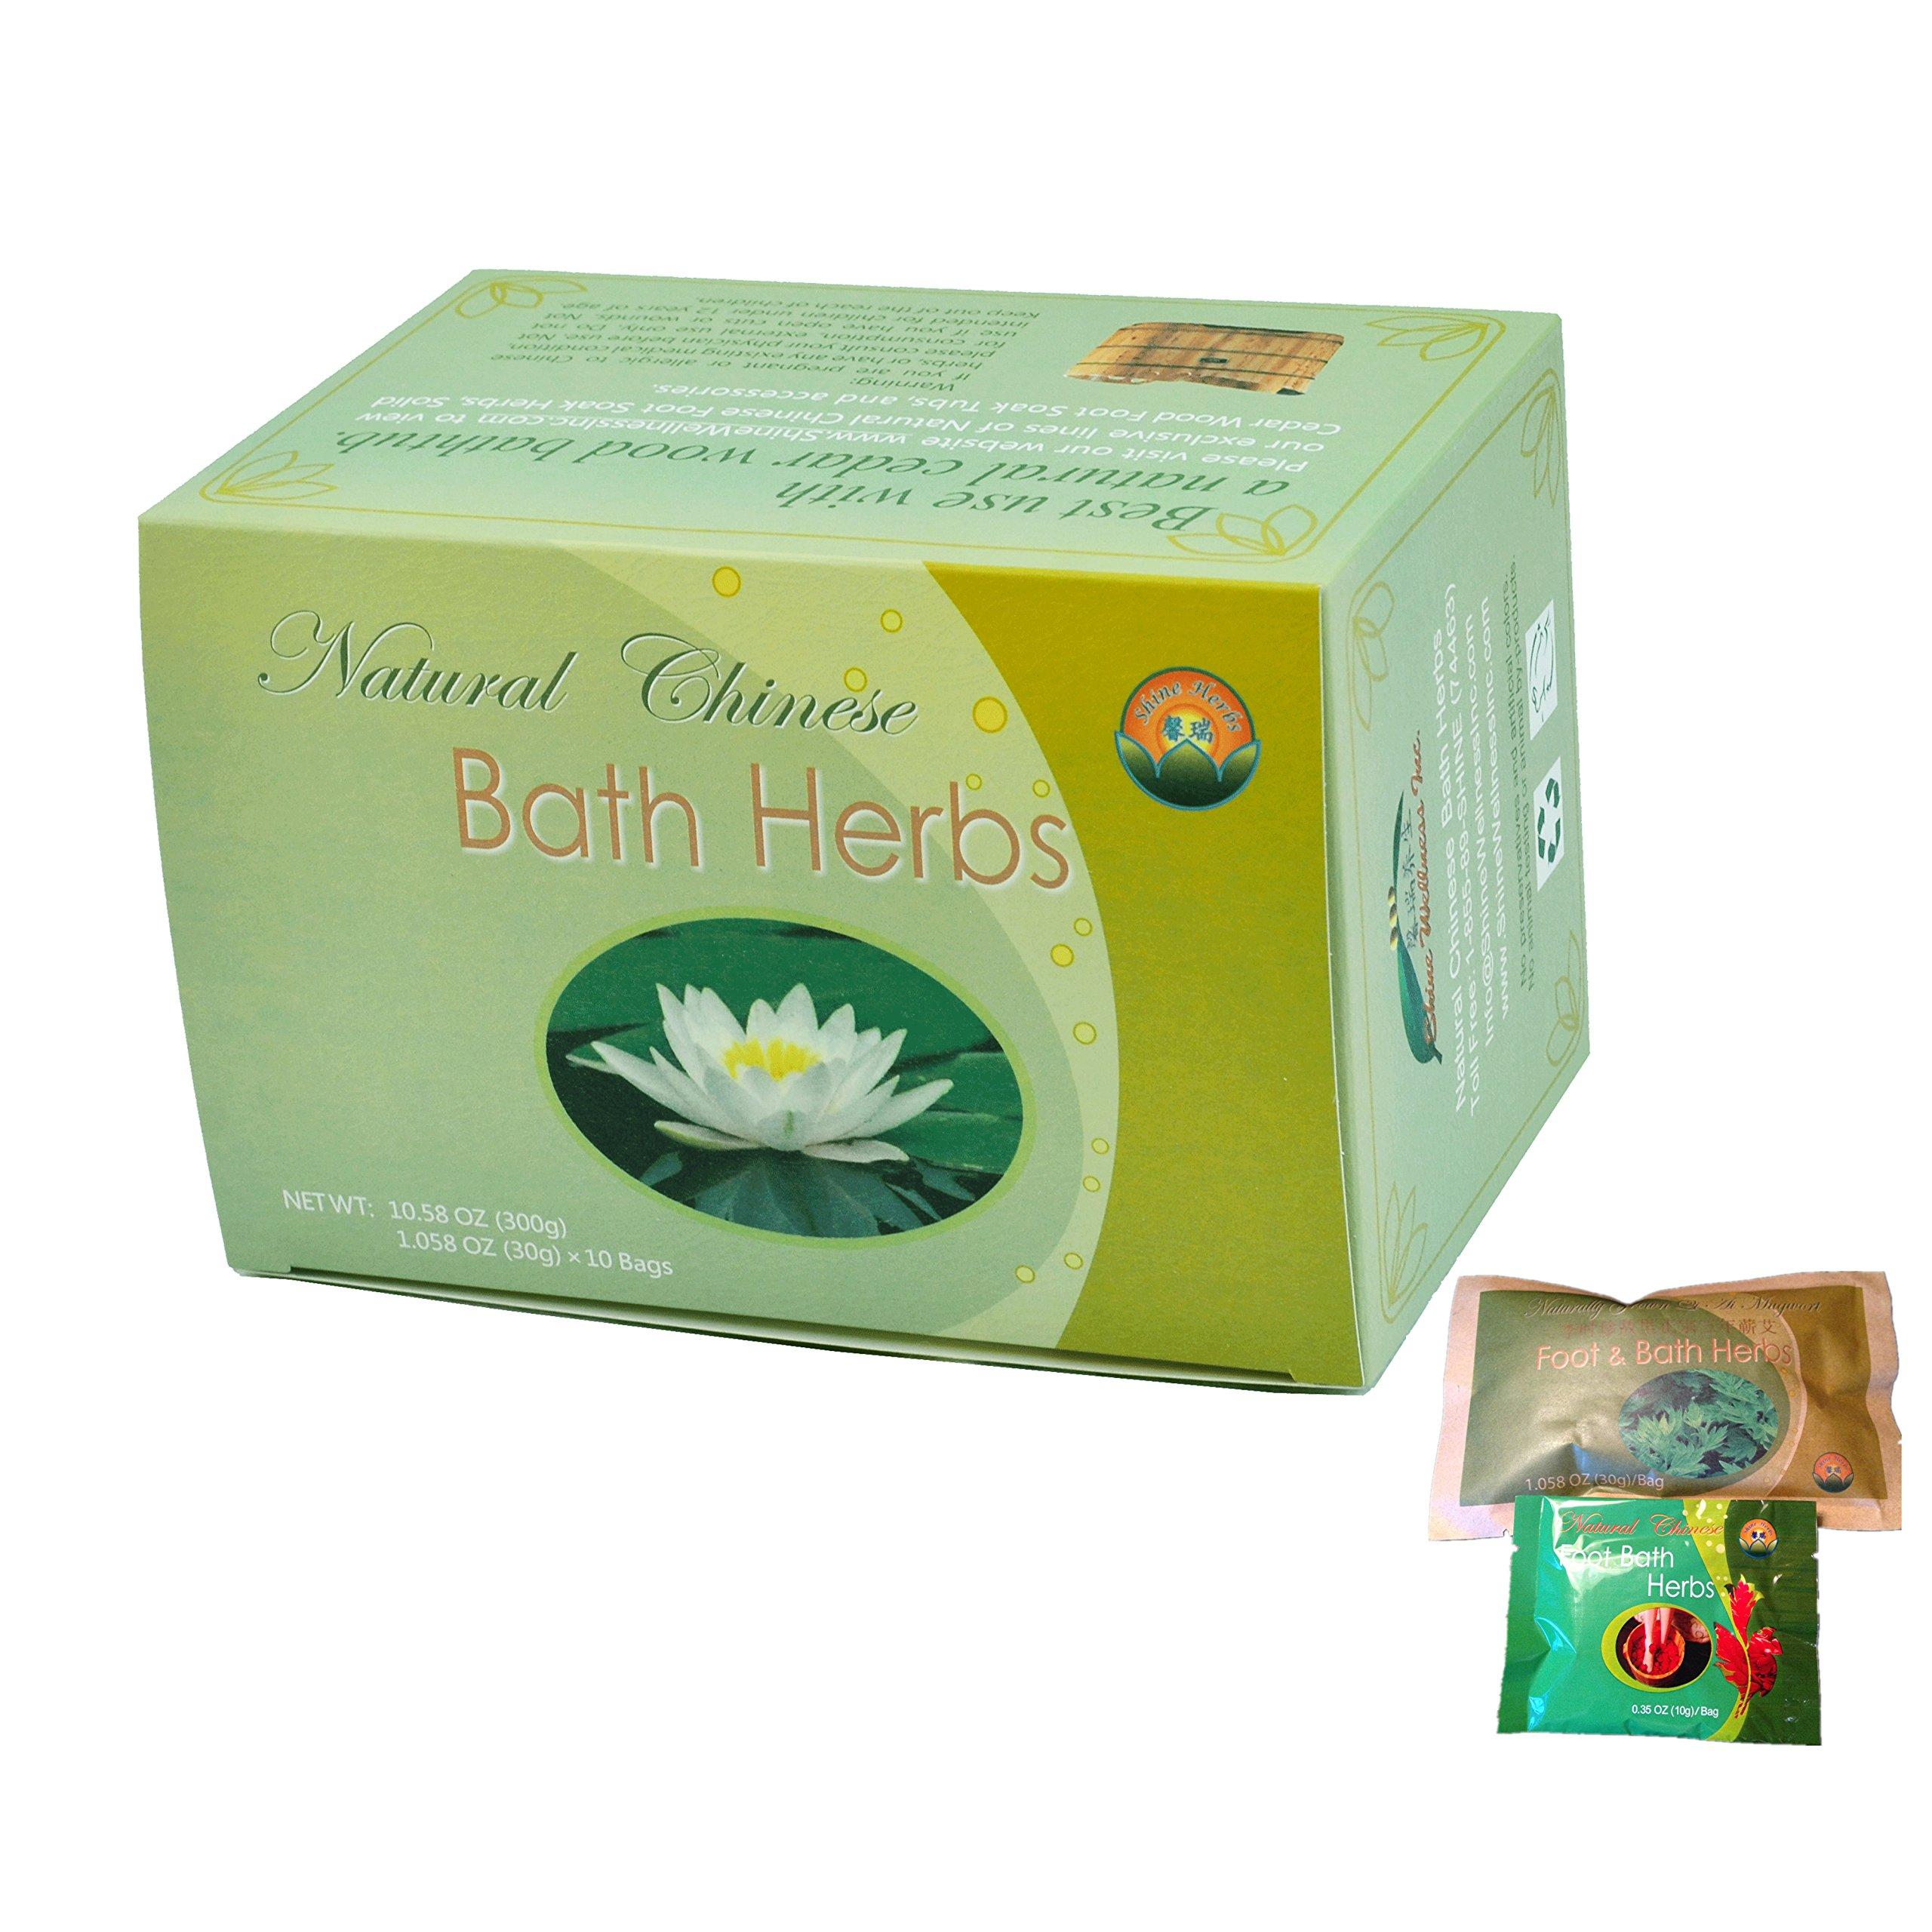 1 Box Bath Herbs Plus 2 FREE bags of Mugwort & Foot Soak Herbs samples $7 Value by Shine Wellness Inc